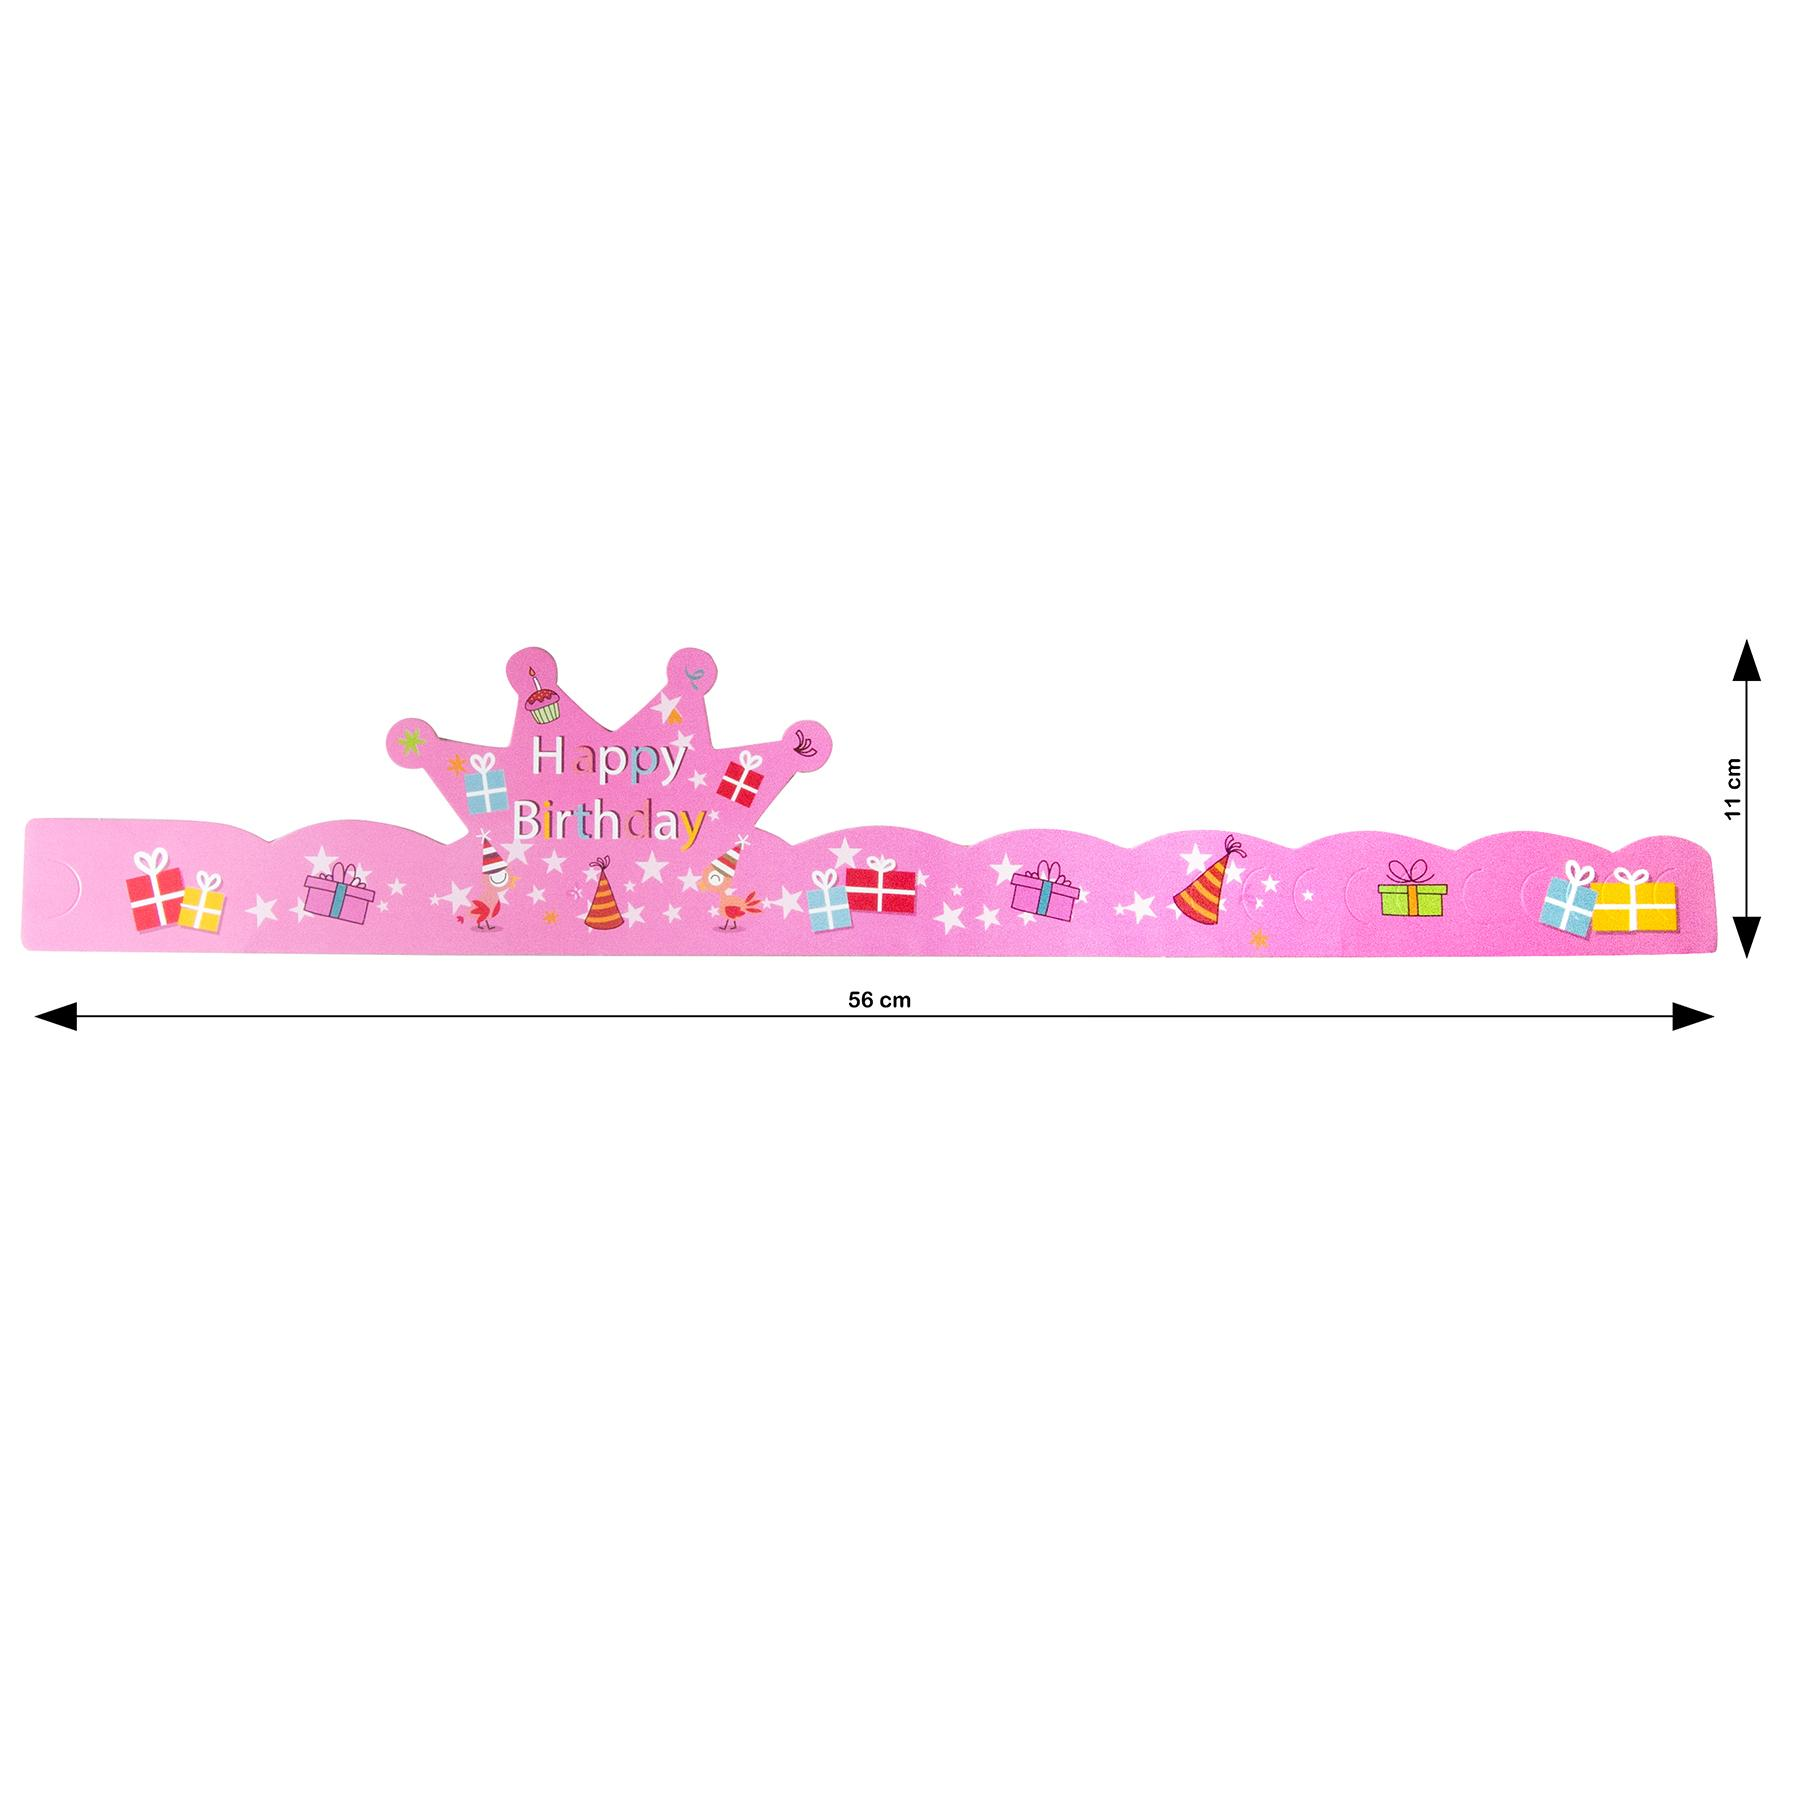 Balonasia Birthday Set Ulang Tahun Gold Pink Daftar Harga Terbaru Dekorasi Backdrop Garis Polkadot Detail Gambar Magnolia Topi Crown